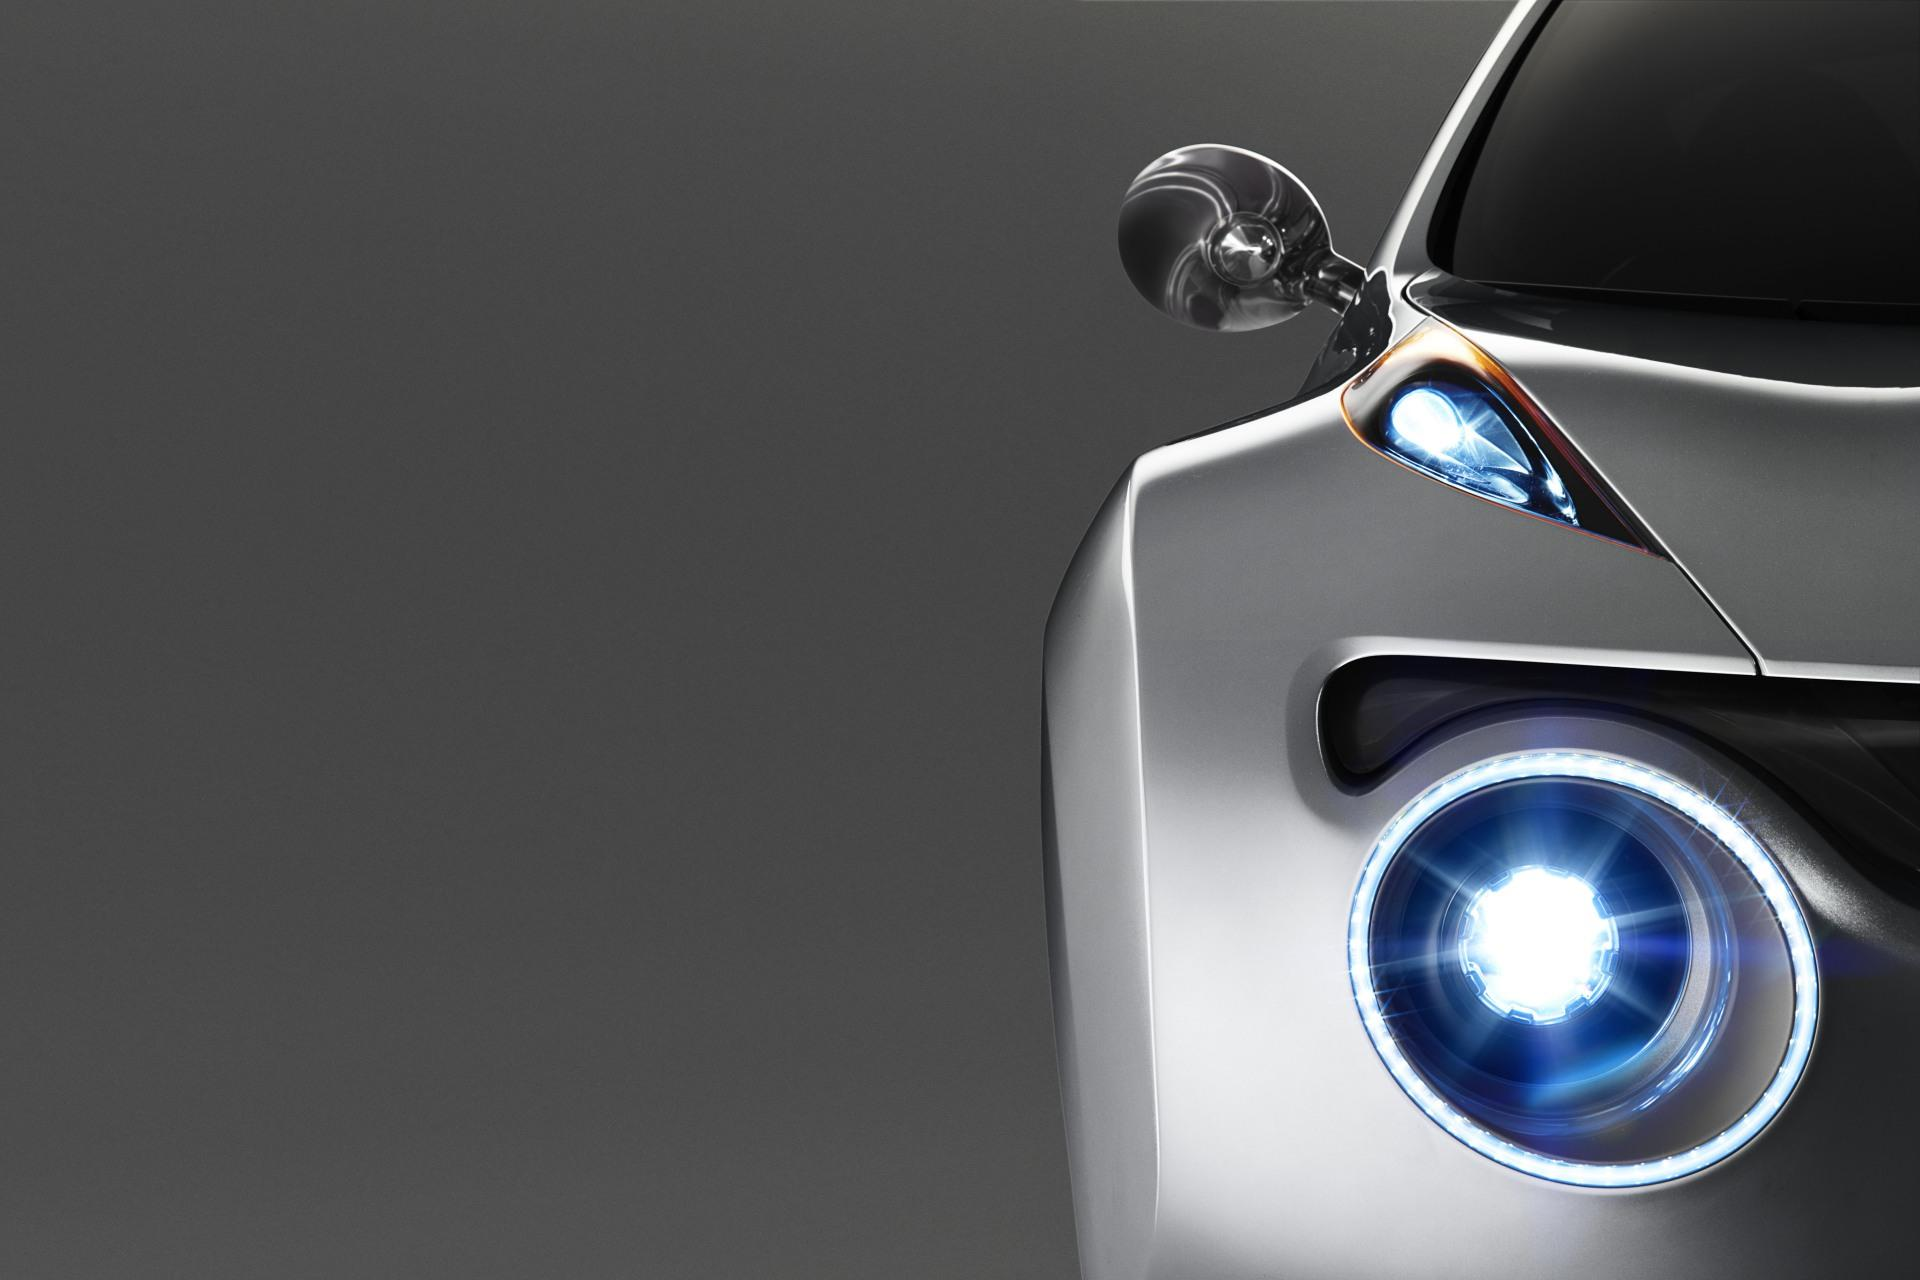 2009 Nissan Qazana Concept